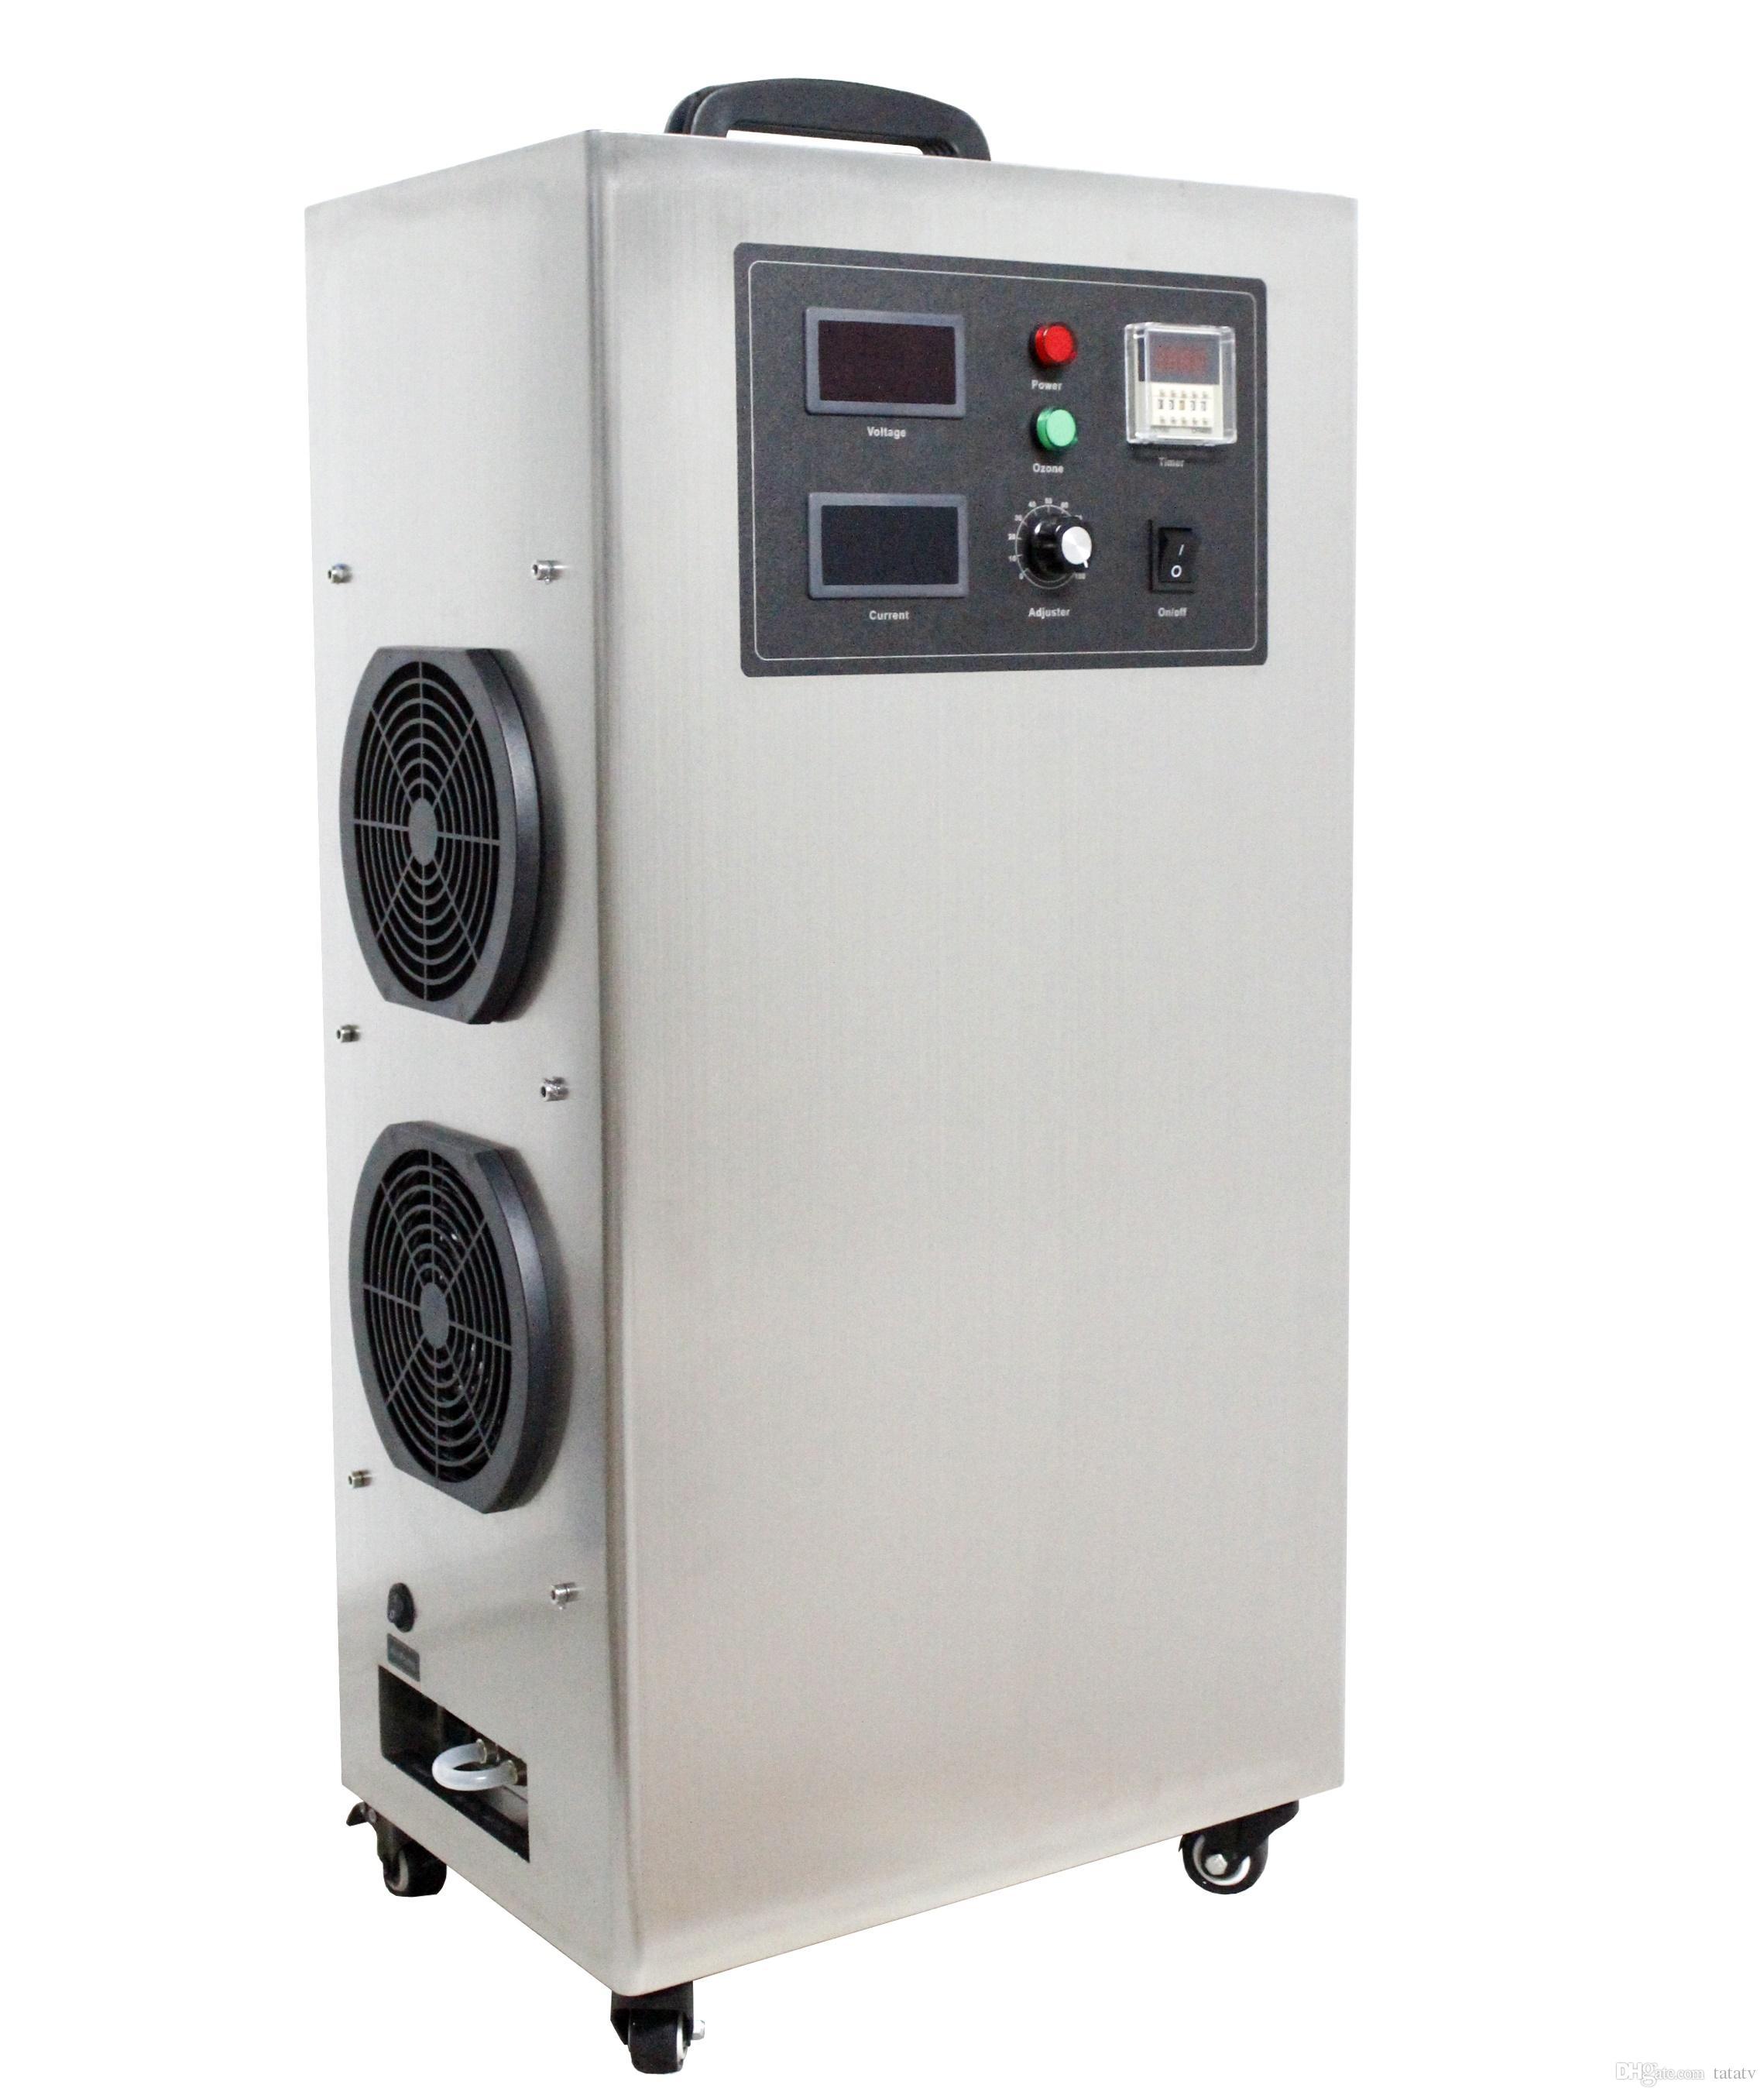 2018 20g ozone generator with 1 venturi injector for home for Koi pond venturi